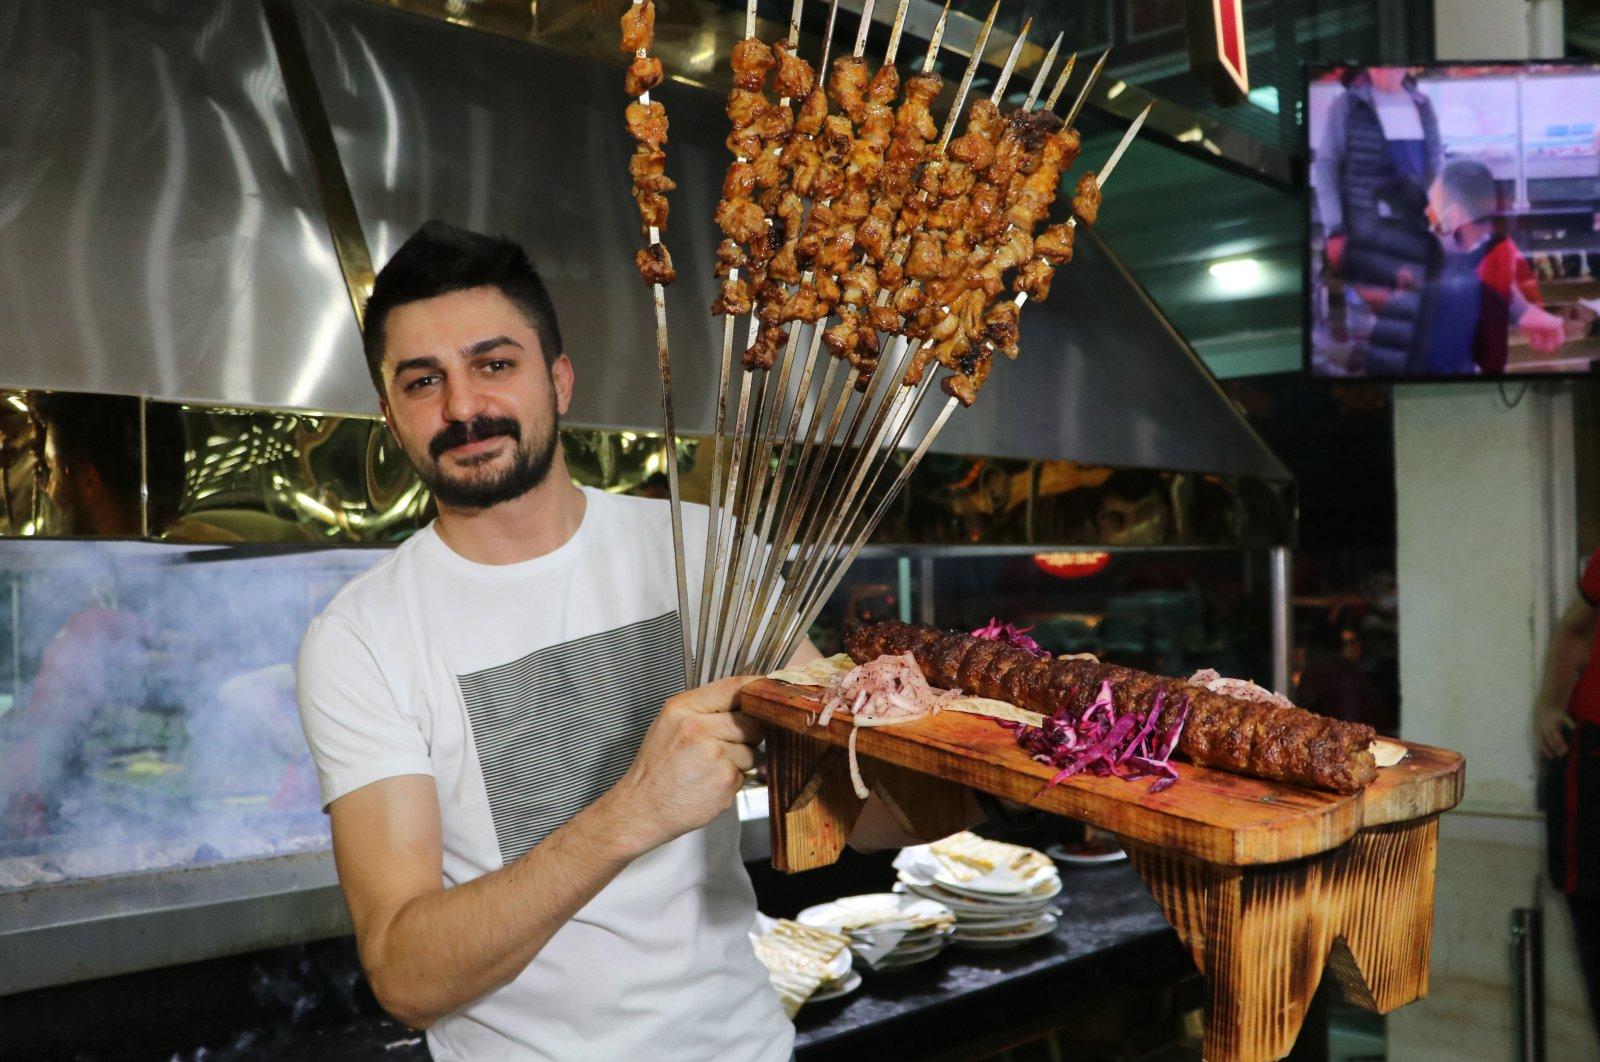 Uğur Aydın poses with various kebabs in his restaurant in Adana, Turkey, June 17, 2021. (IHA Photo)